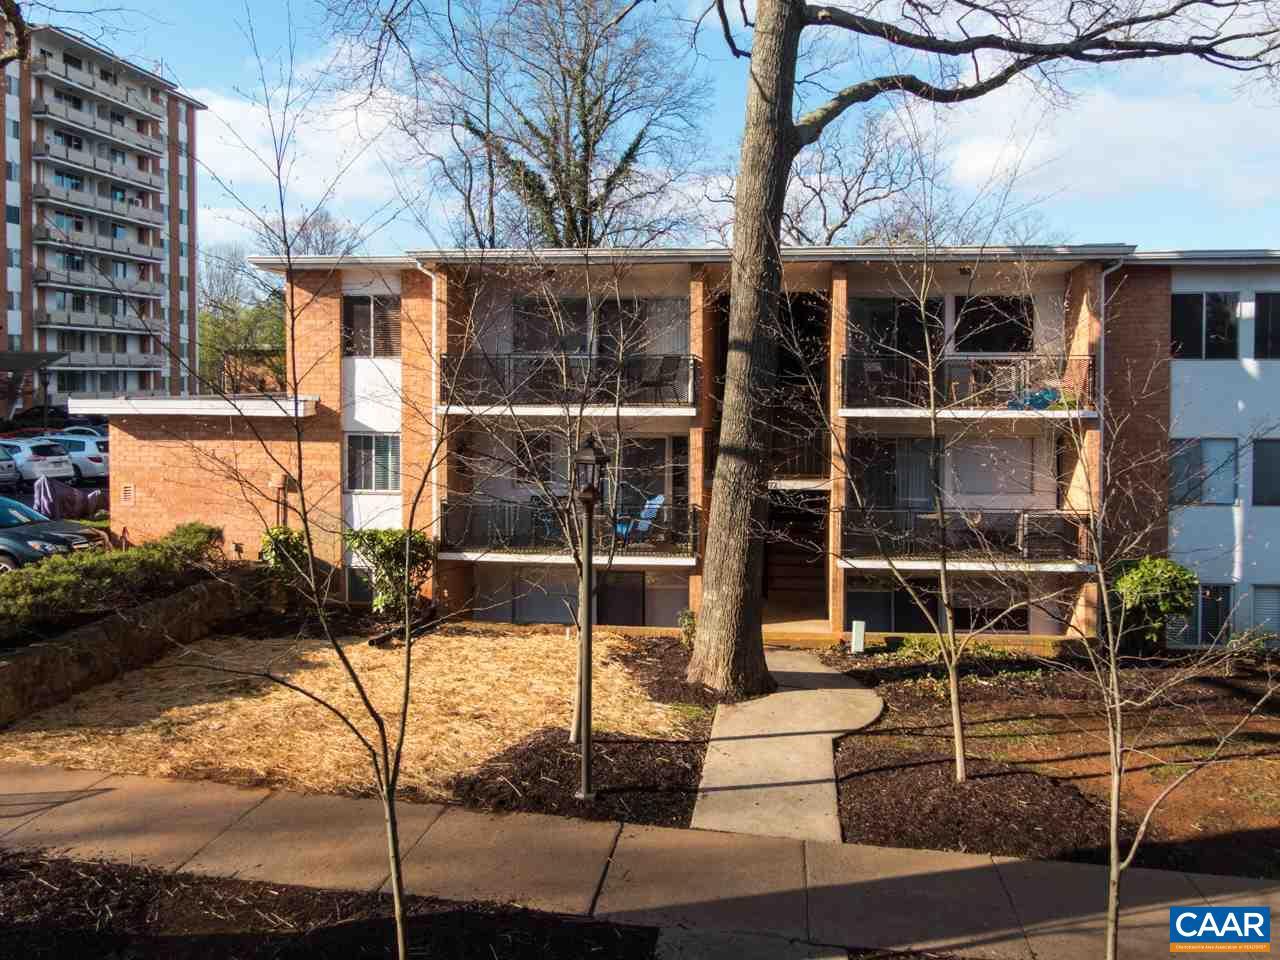 homes located near the university of virginia 1800 jefferson park ave b62 charlottesville va 22903